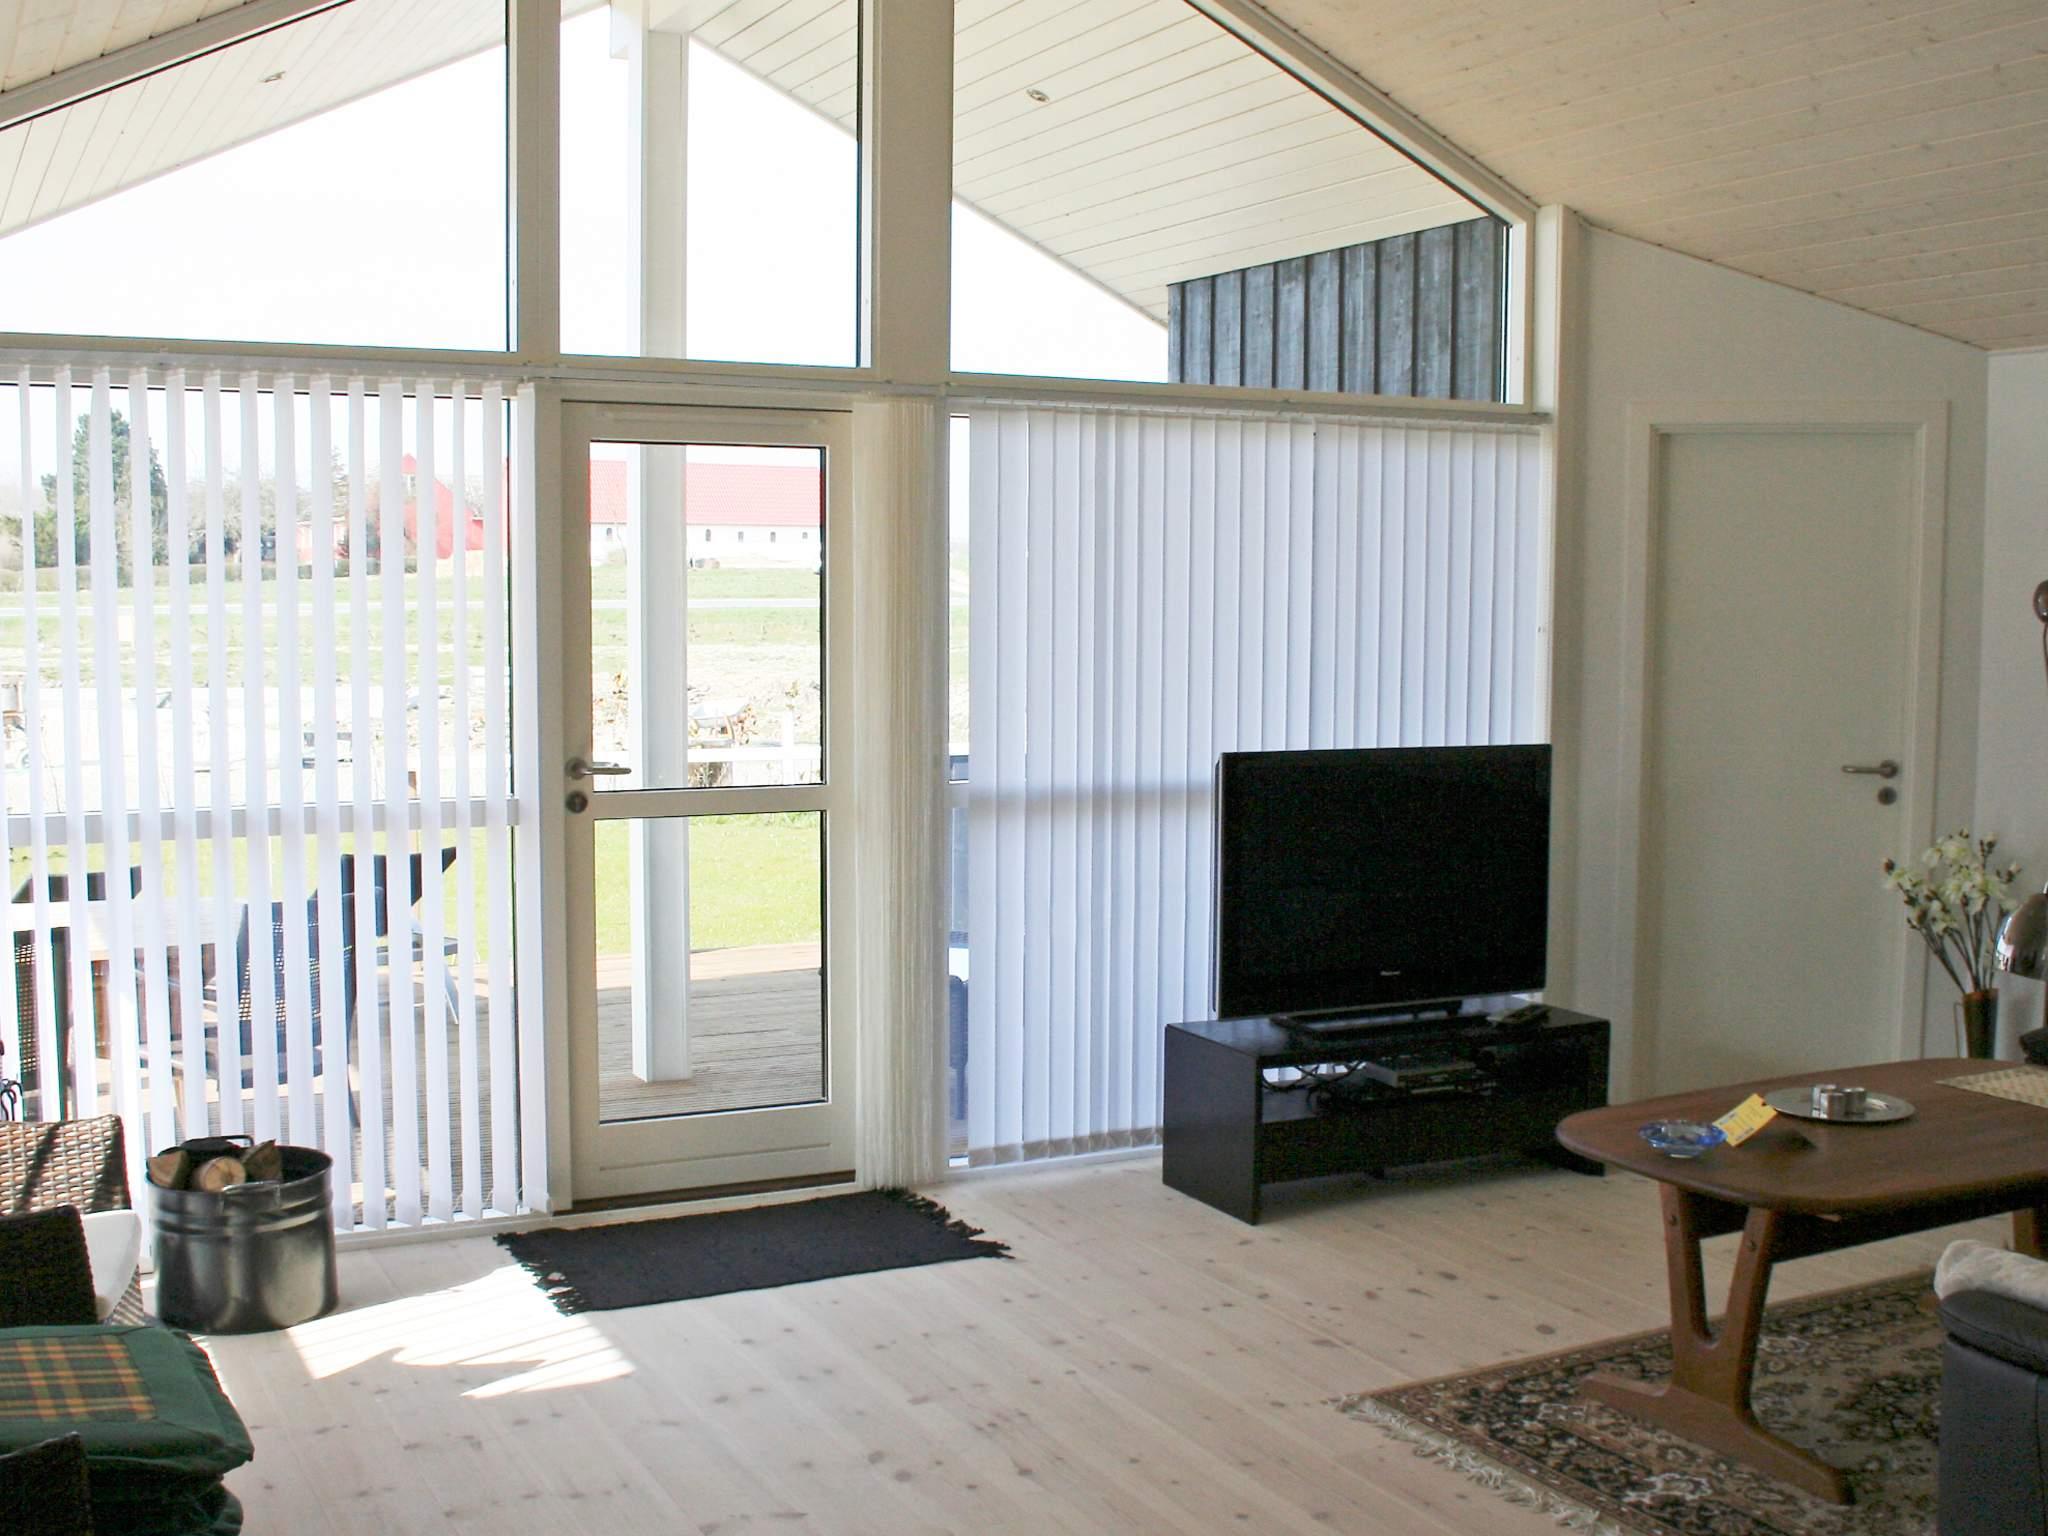 Ferienhaus Balka Strand (334426), Balke, , Bornholm, Dänemark, Bild 4